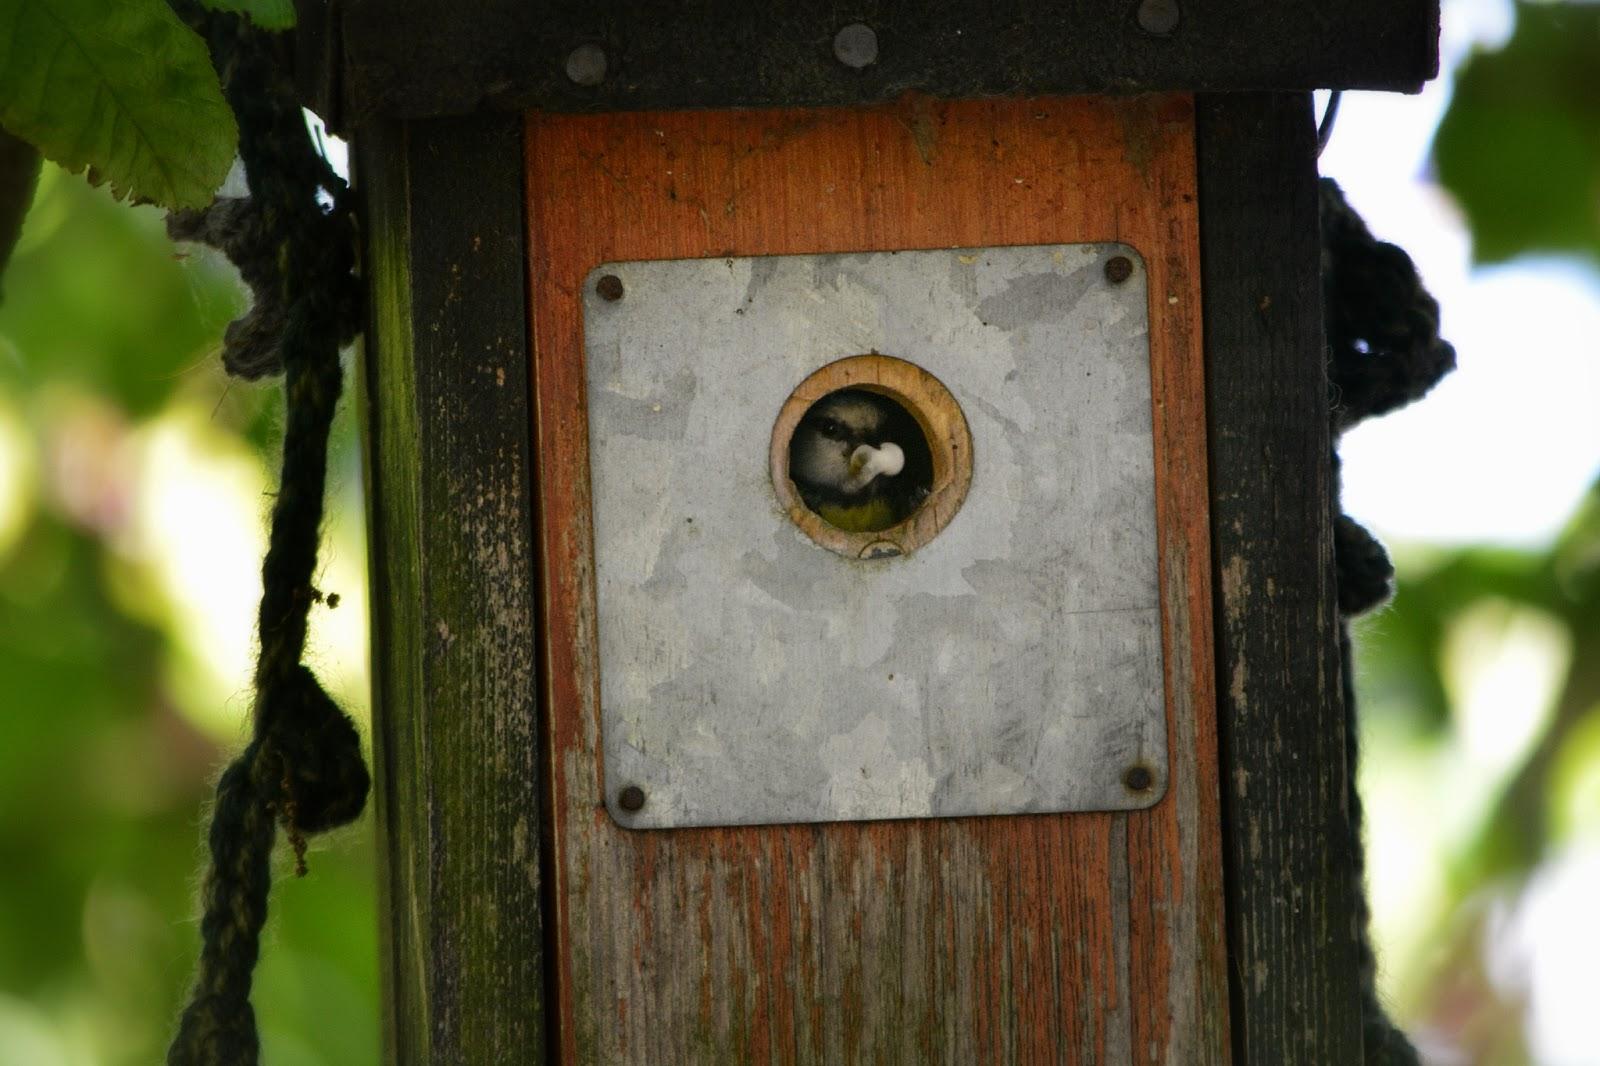 Olann: Federn, fu00e4rben und fotografieren im verregneten Garten